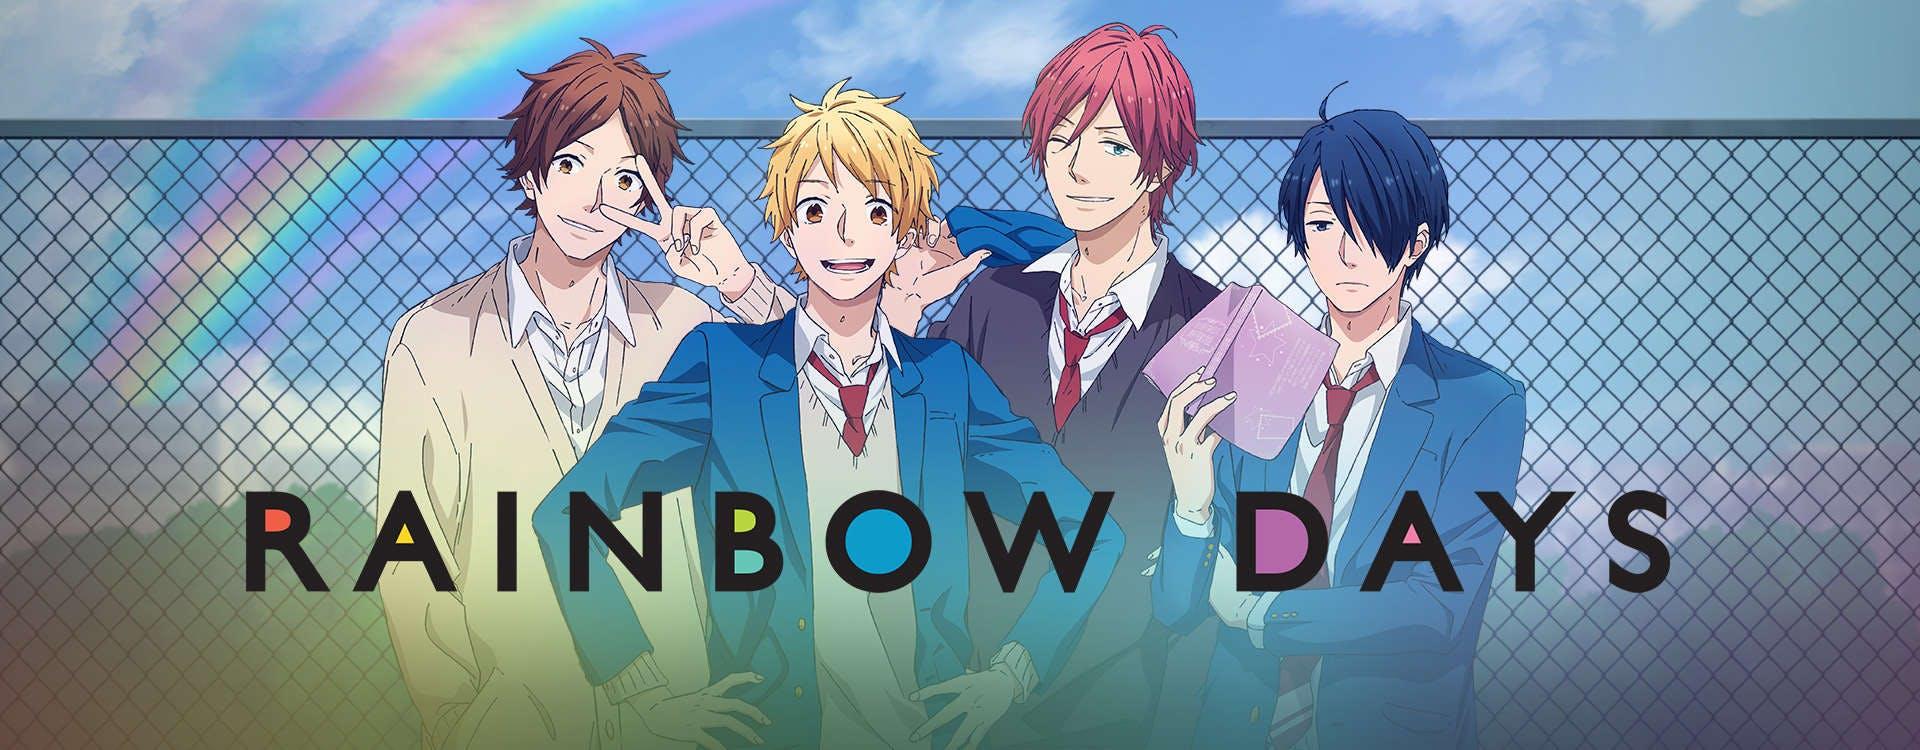 best romance anime : rainbow days